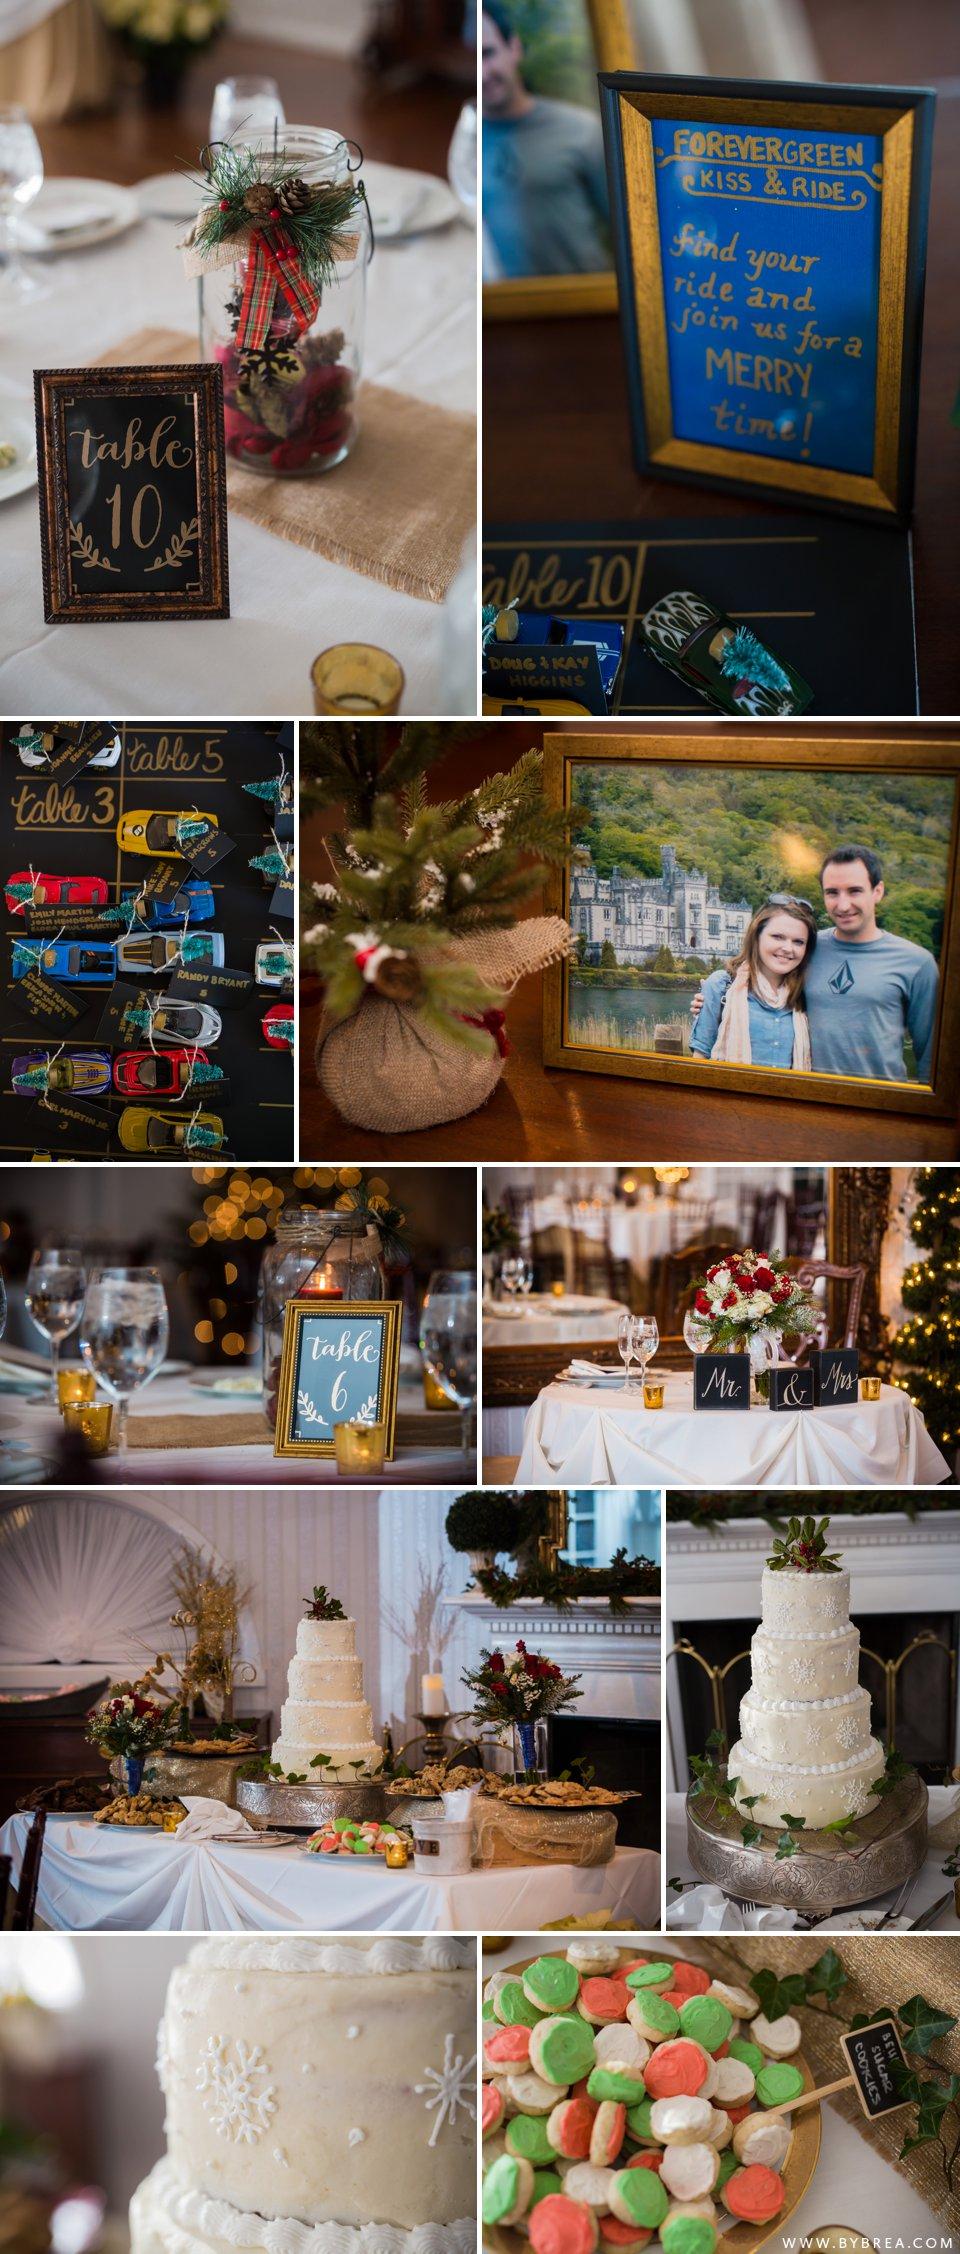 katy-chris-winter-antrim-1844-wedding_0992